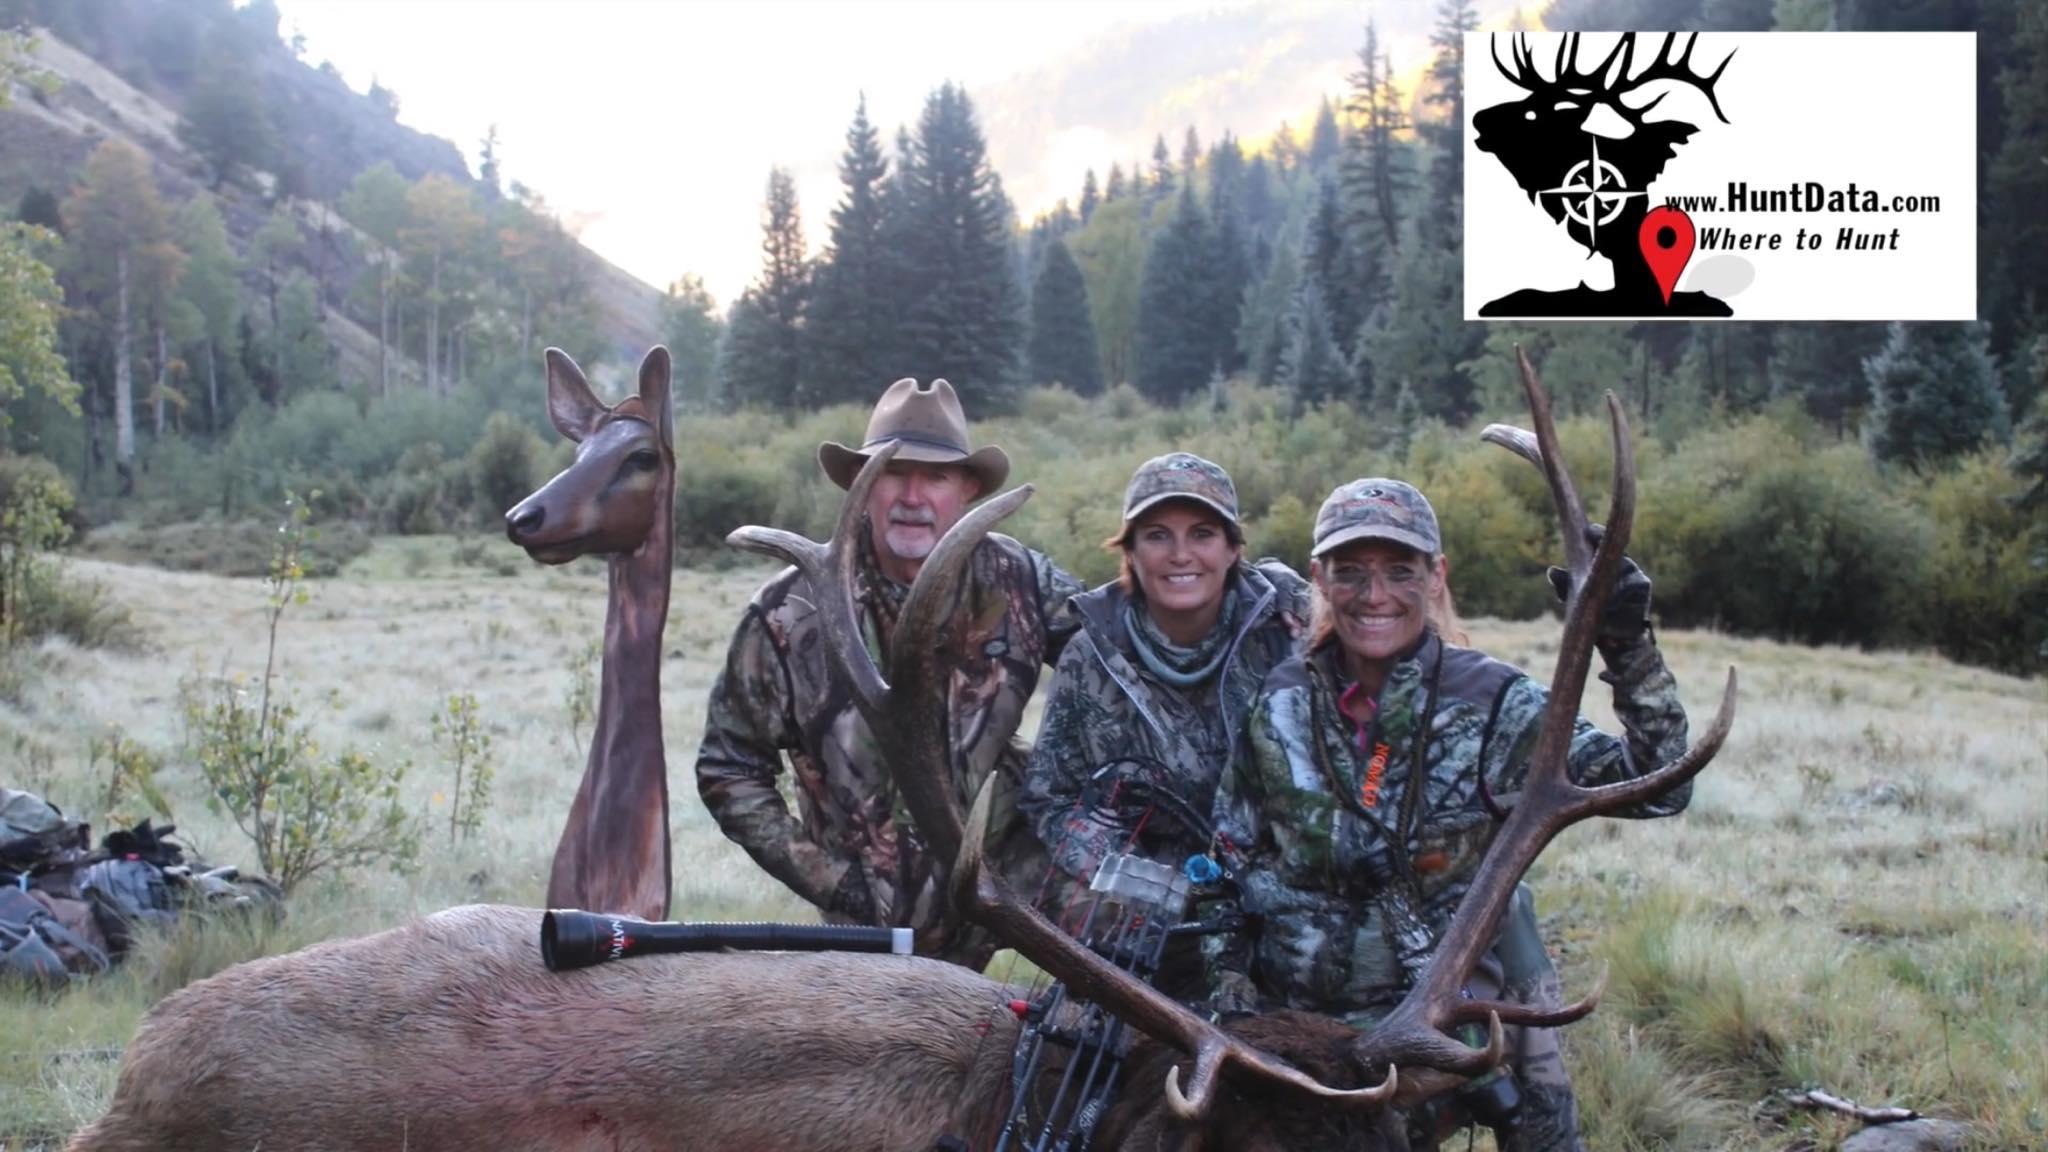 October 14: Hunt Data & Lone Star Hunts – Hog Hunting in Texas